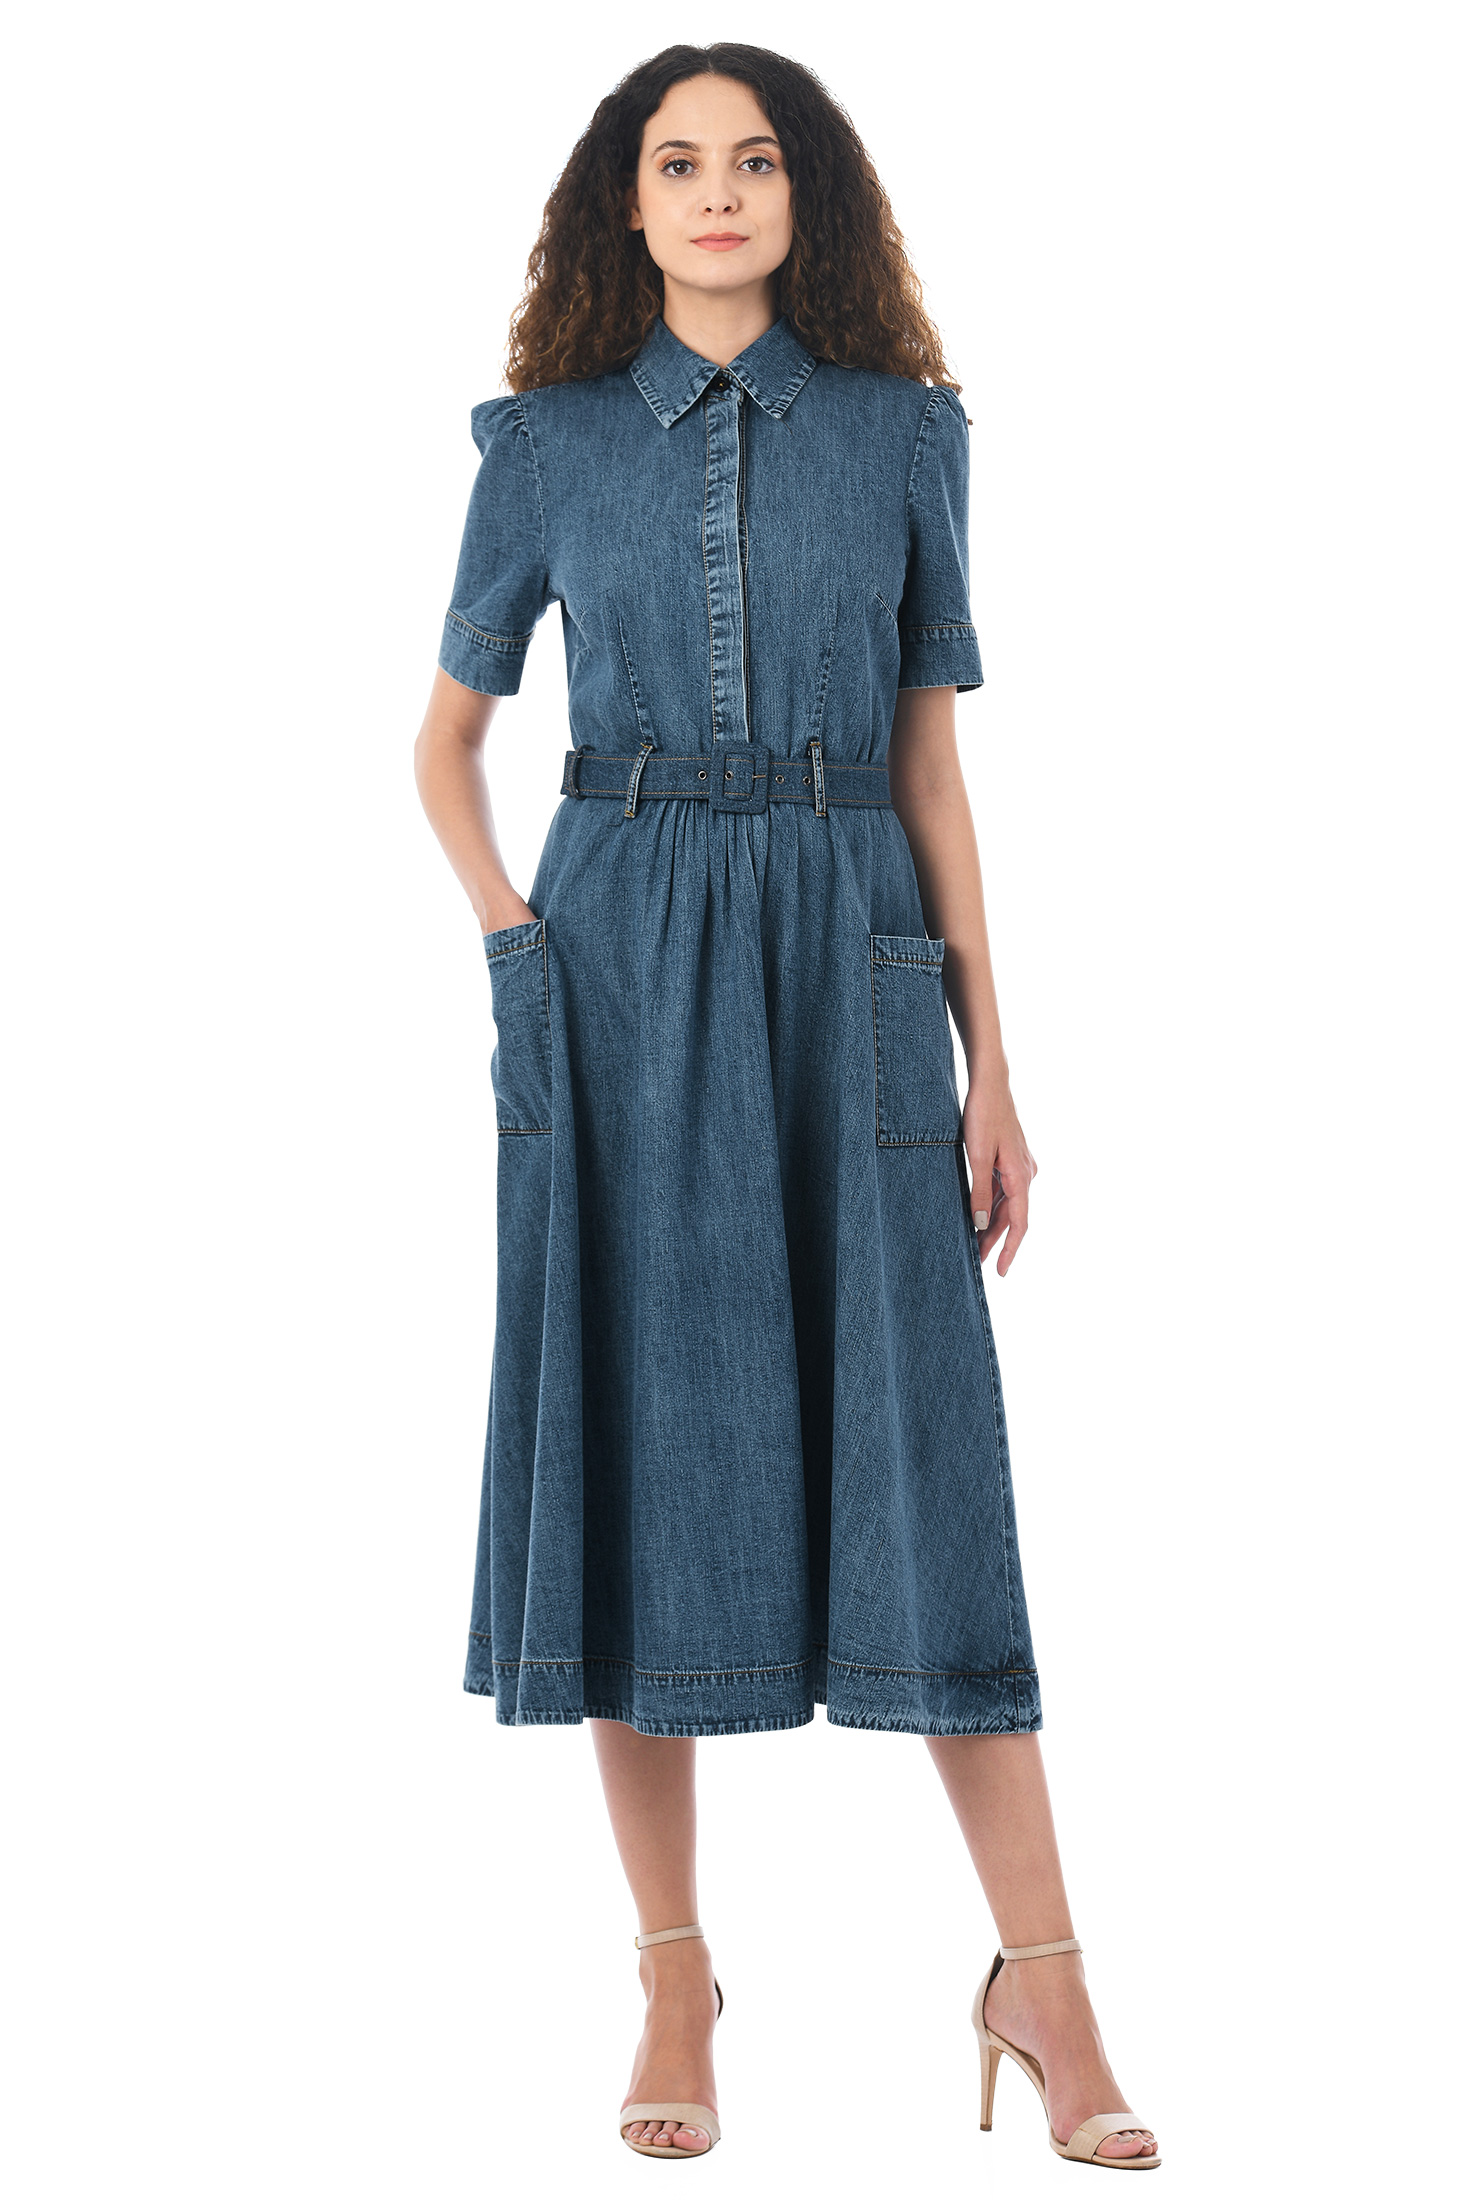 0bb3650d55e Women s Fashion Clothing 0-36W and Custom